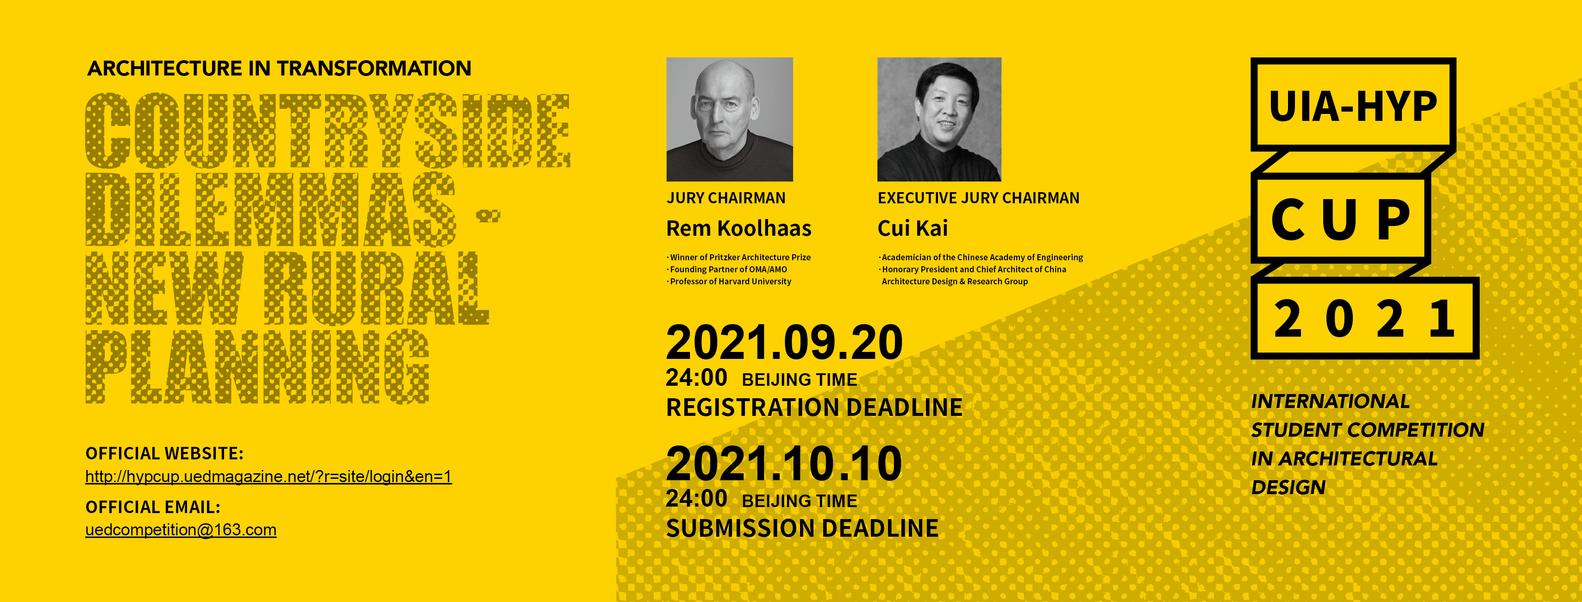 UIA-HYP CUP Διεθνής Φοιτητικός Αρχιτεκτονικός Διαγωνισμός